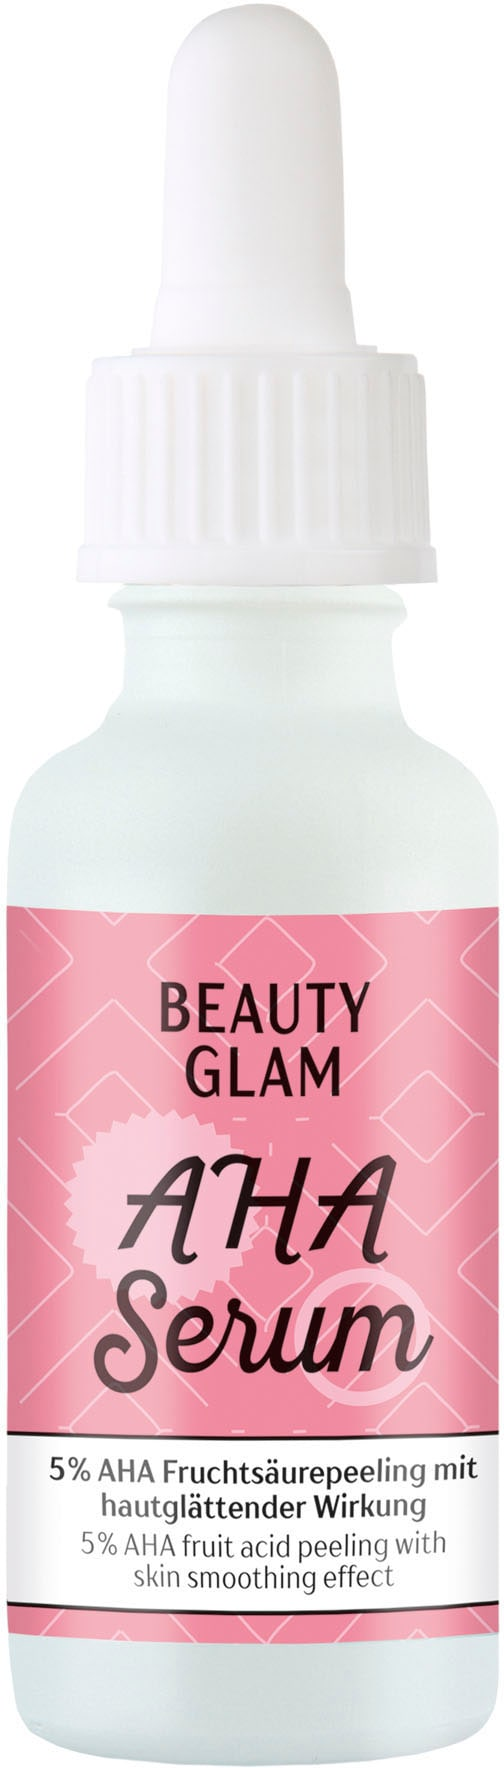 beauty glam -  Gesichtspflege-Set Clear Skin Duo, (2 tlg.)